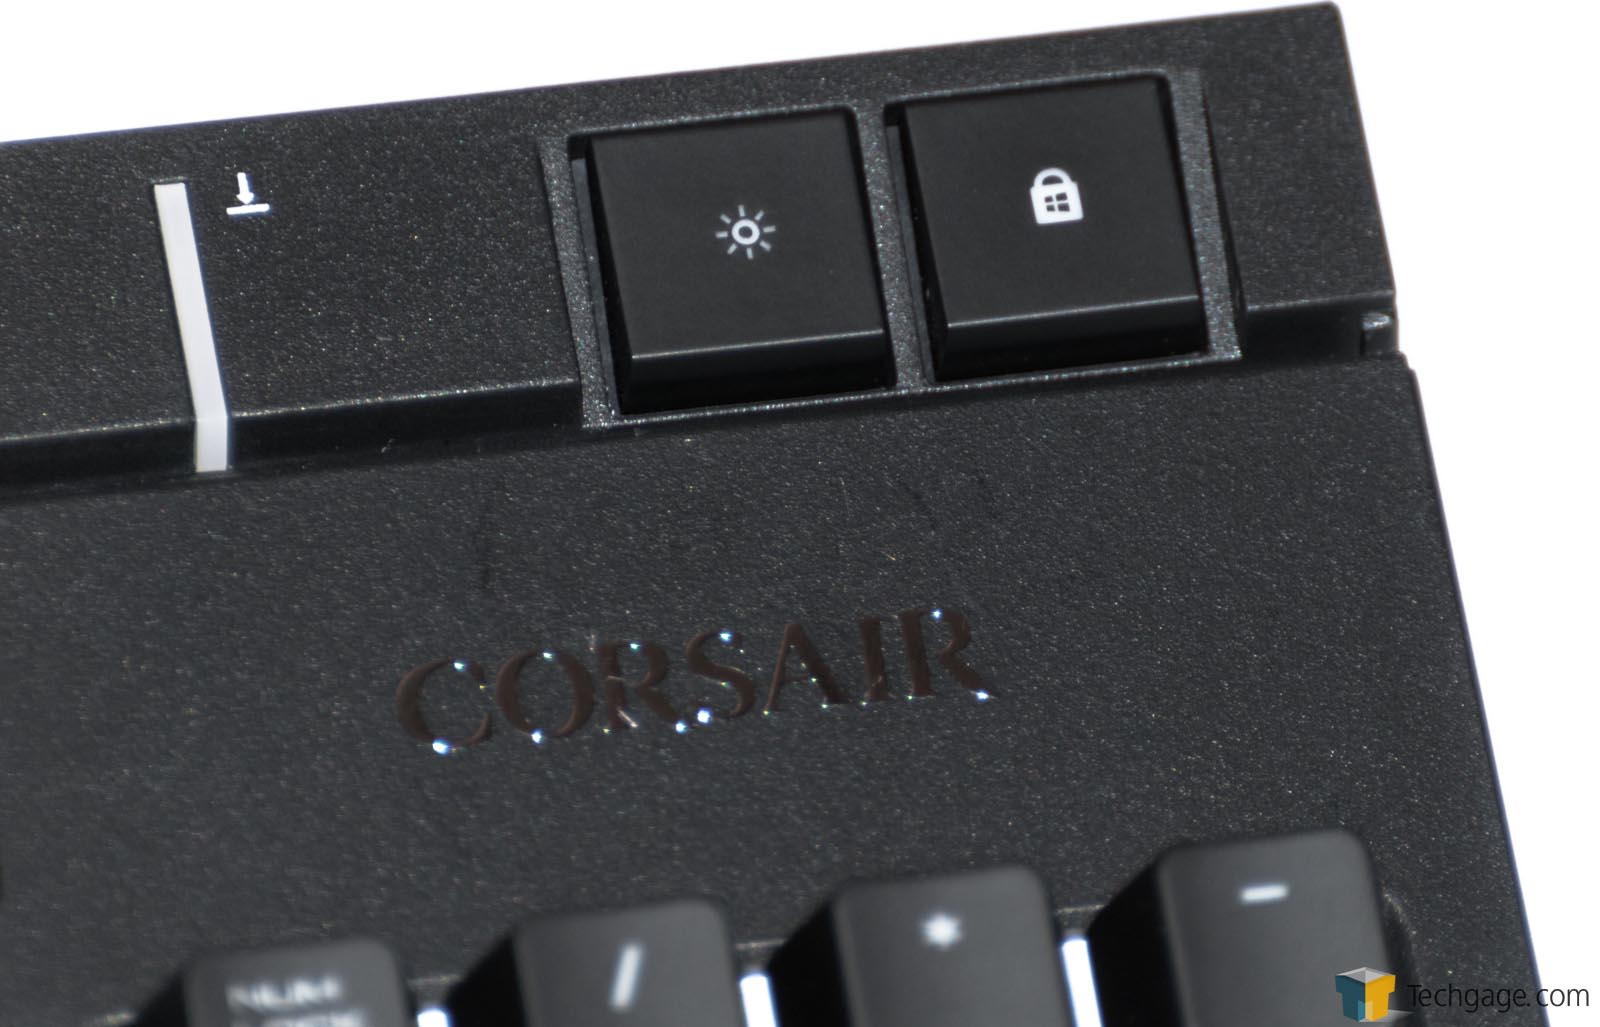 Corsair Strafe RGB Silent Mechanical Keyboard Review – Techgage